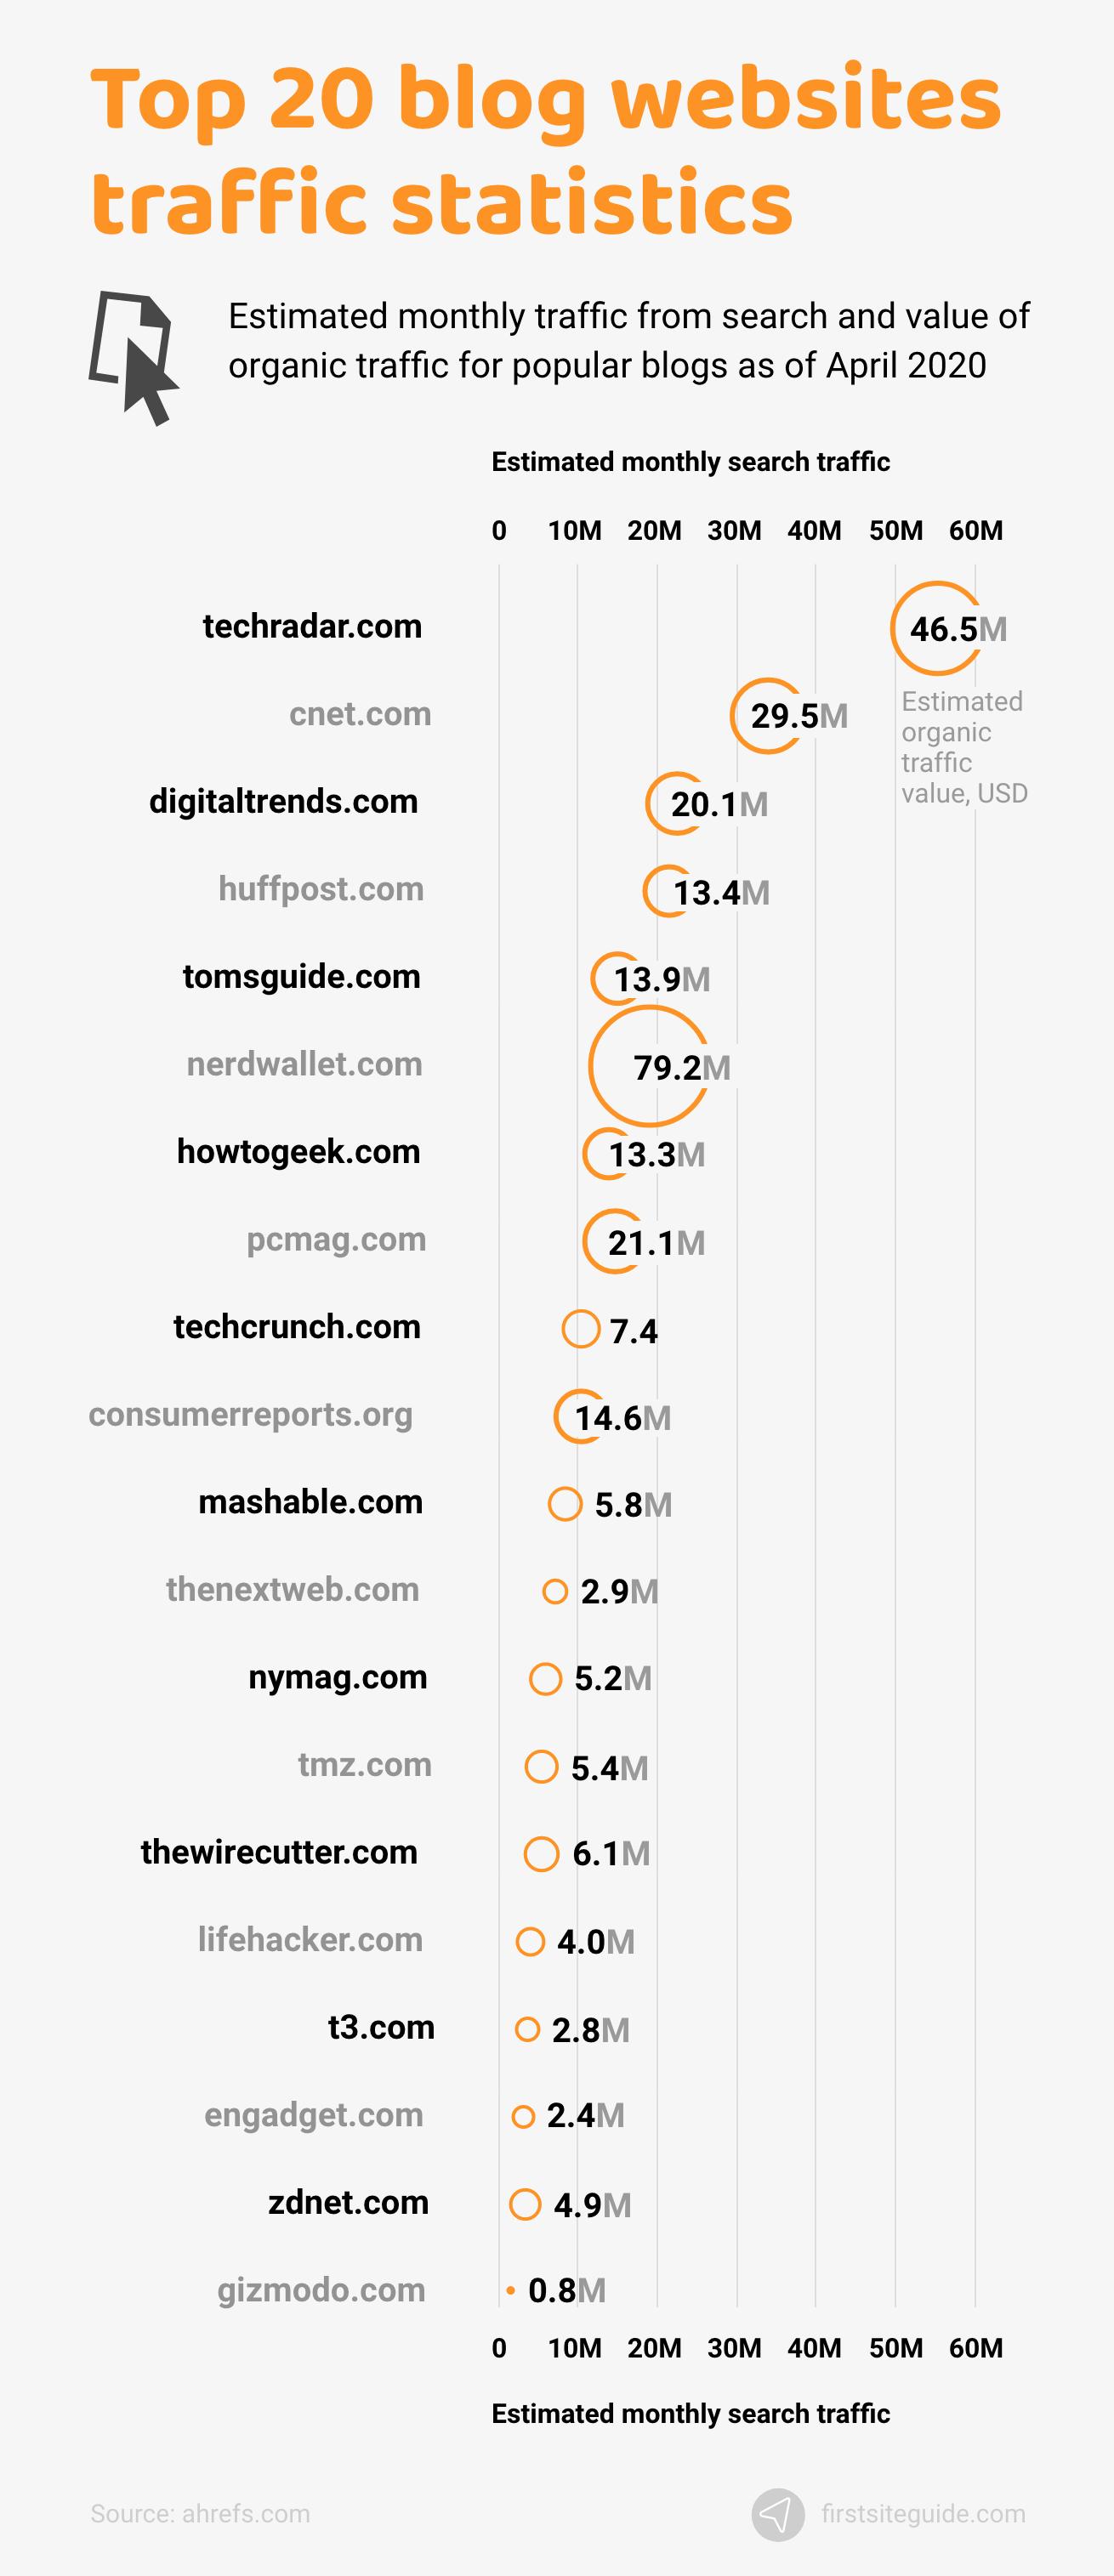 Top 20 blog websites traffic statistics